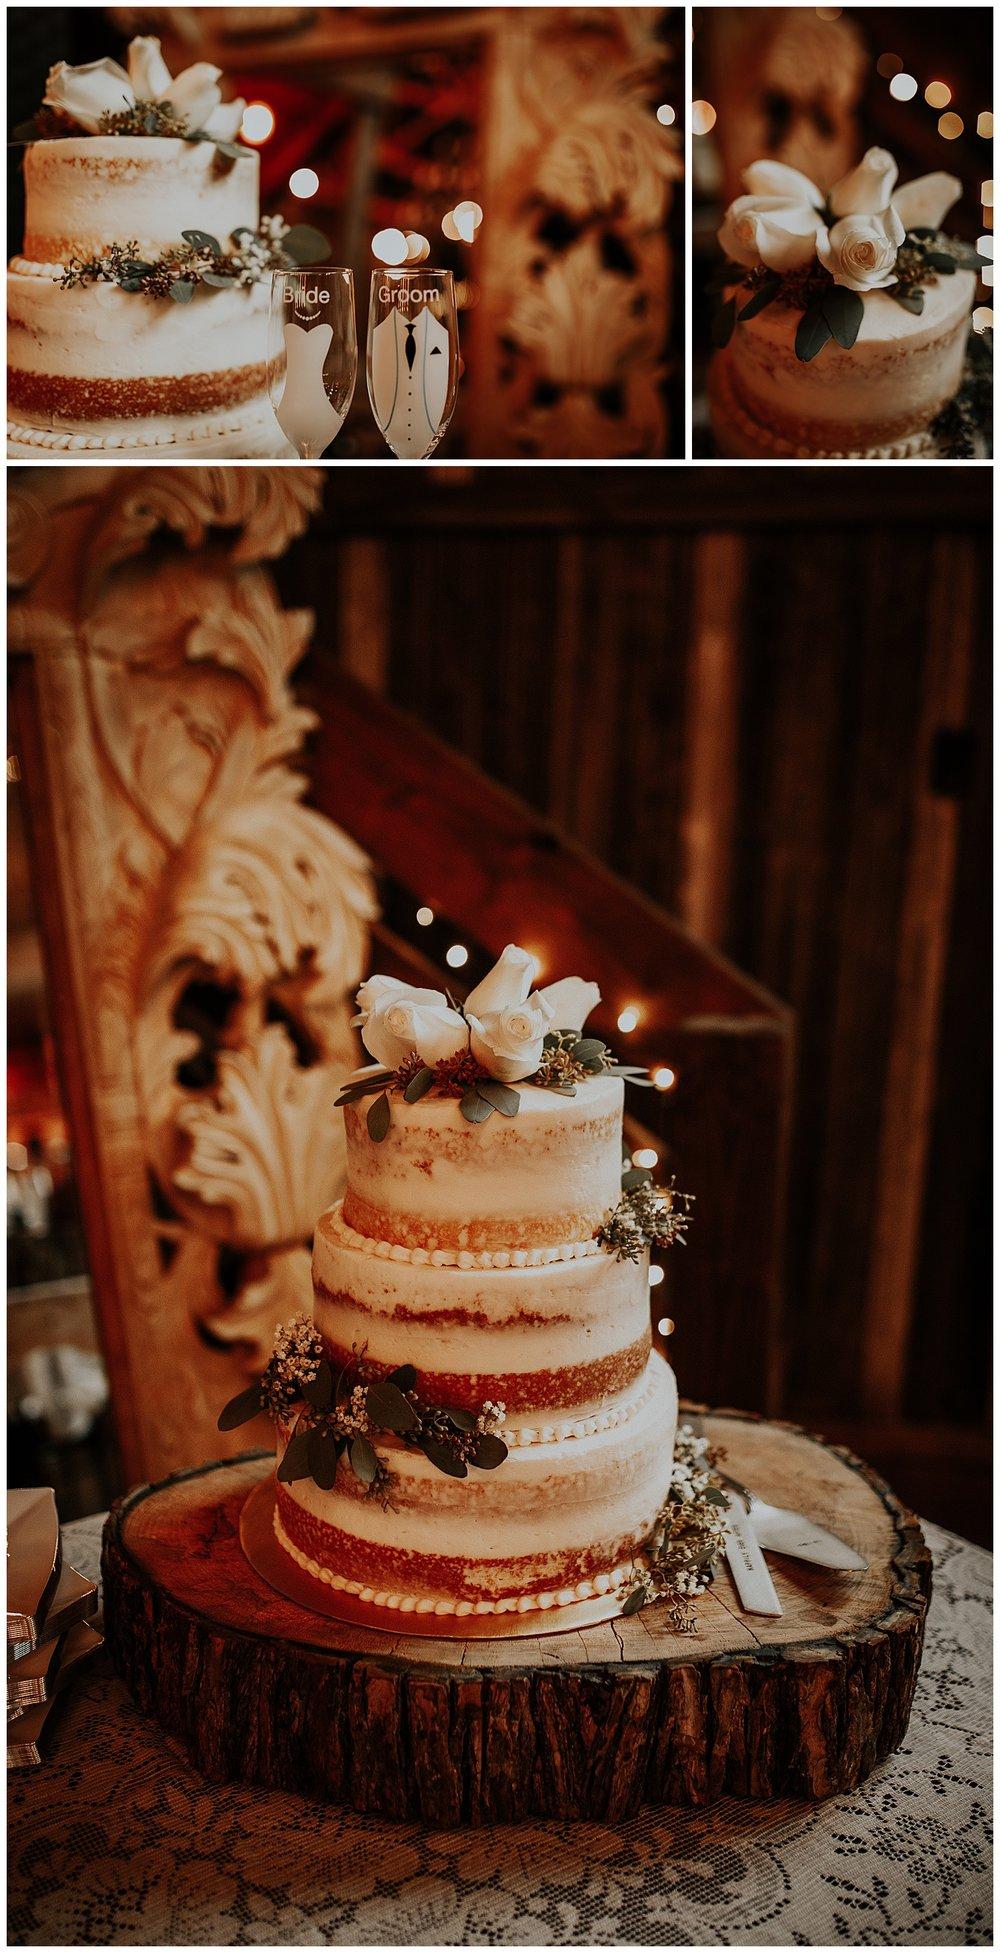 Laken-Mackenzie-Photography-Burge-Wedding-Stillwater-Meadow-Aledo-Texas-Dallas-Fort-Worth-Wedding-Photographer13.jpg